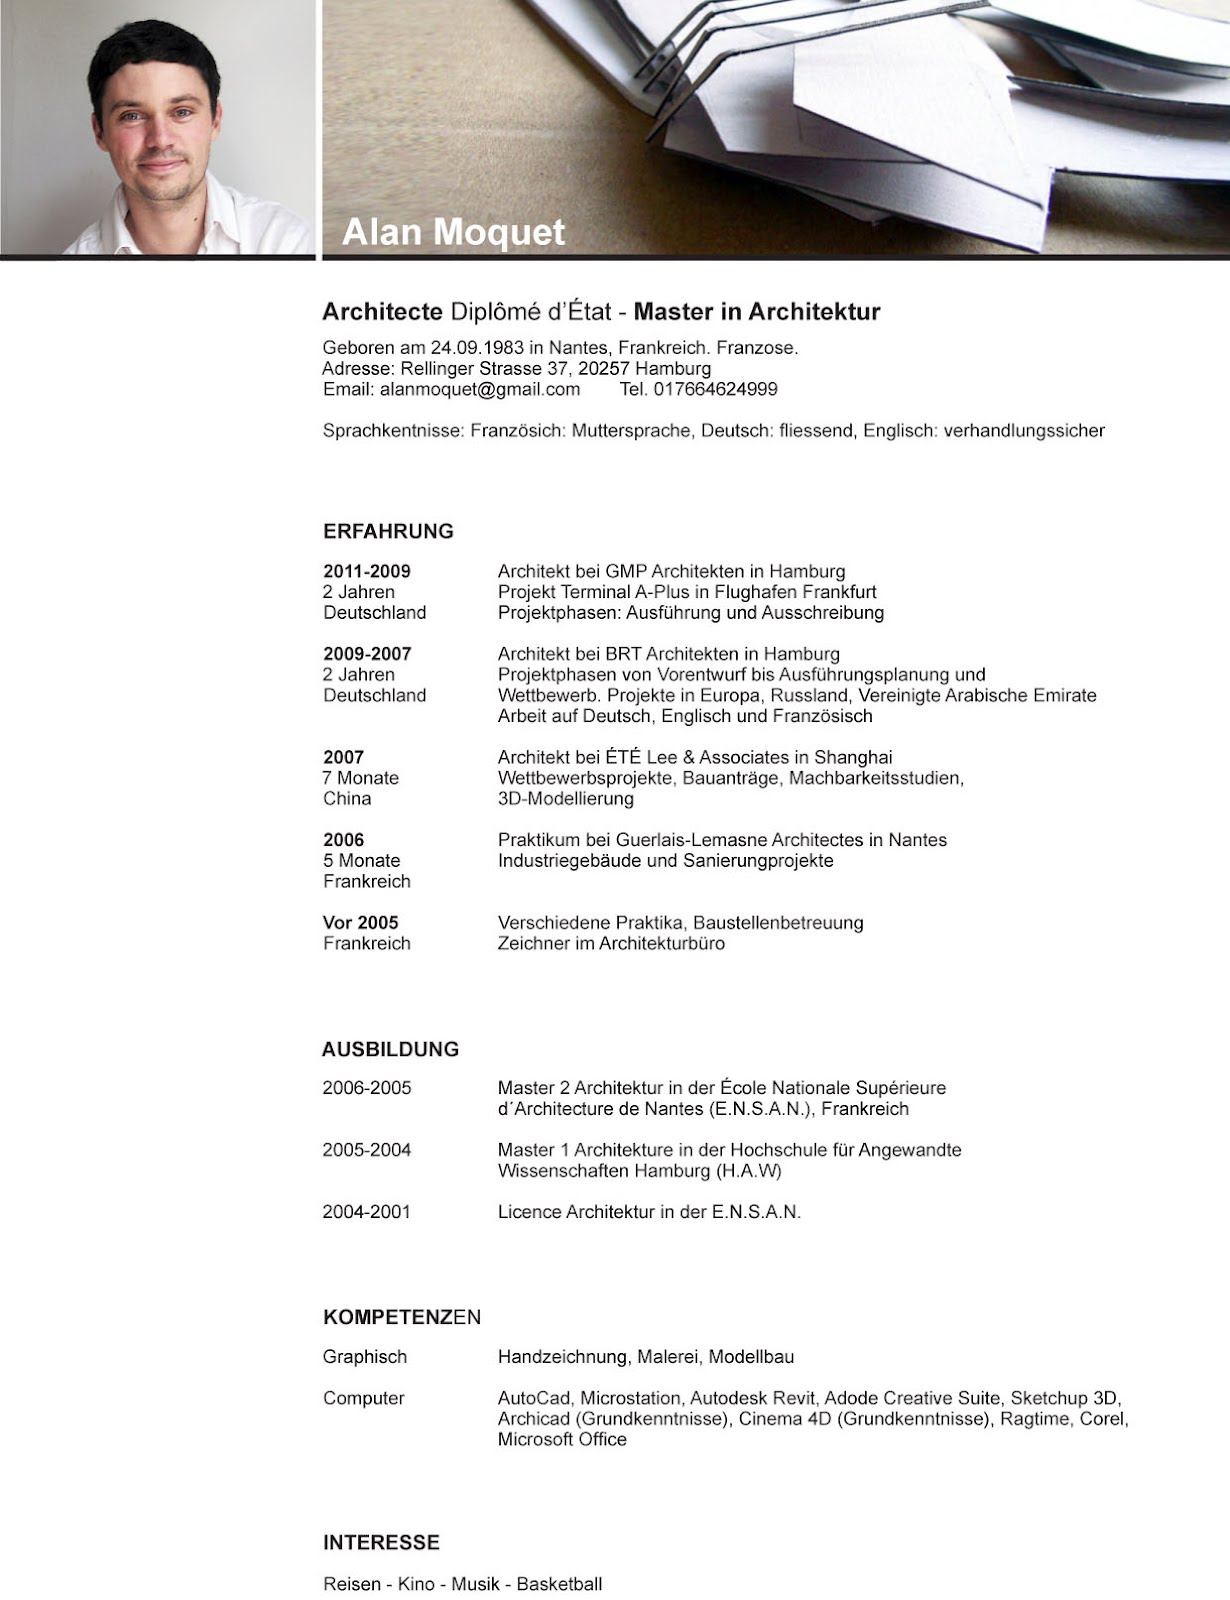 resume resume auf deutsch regularguyrant best resume site for